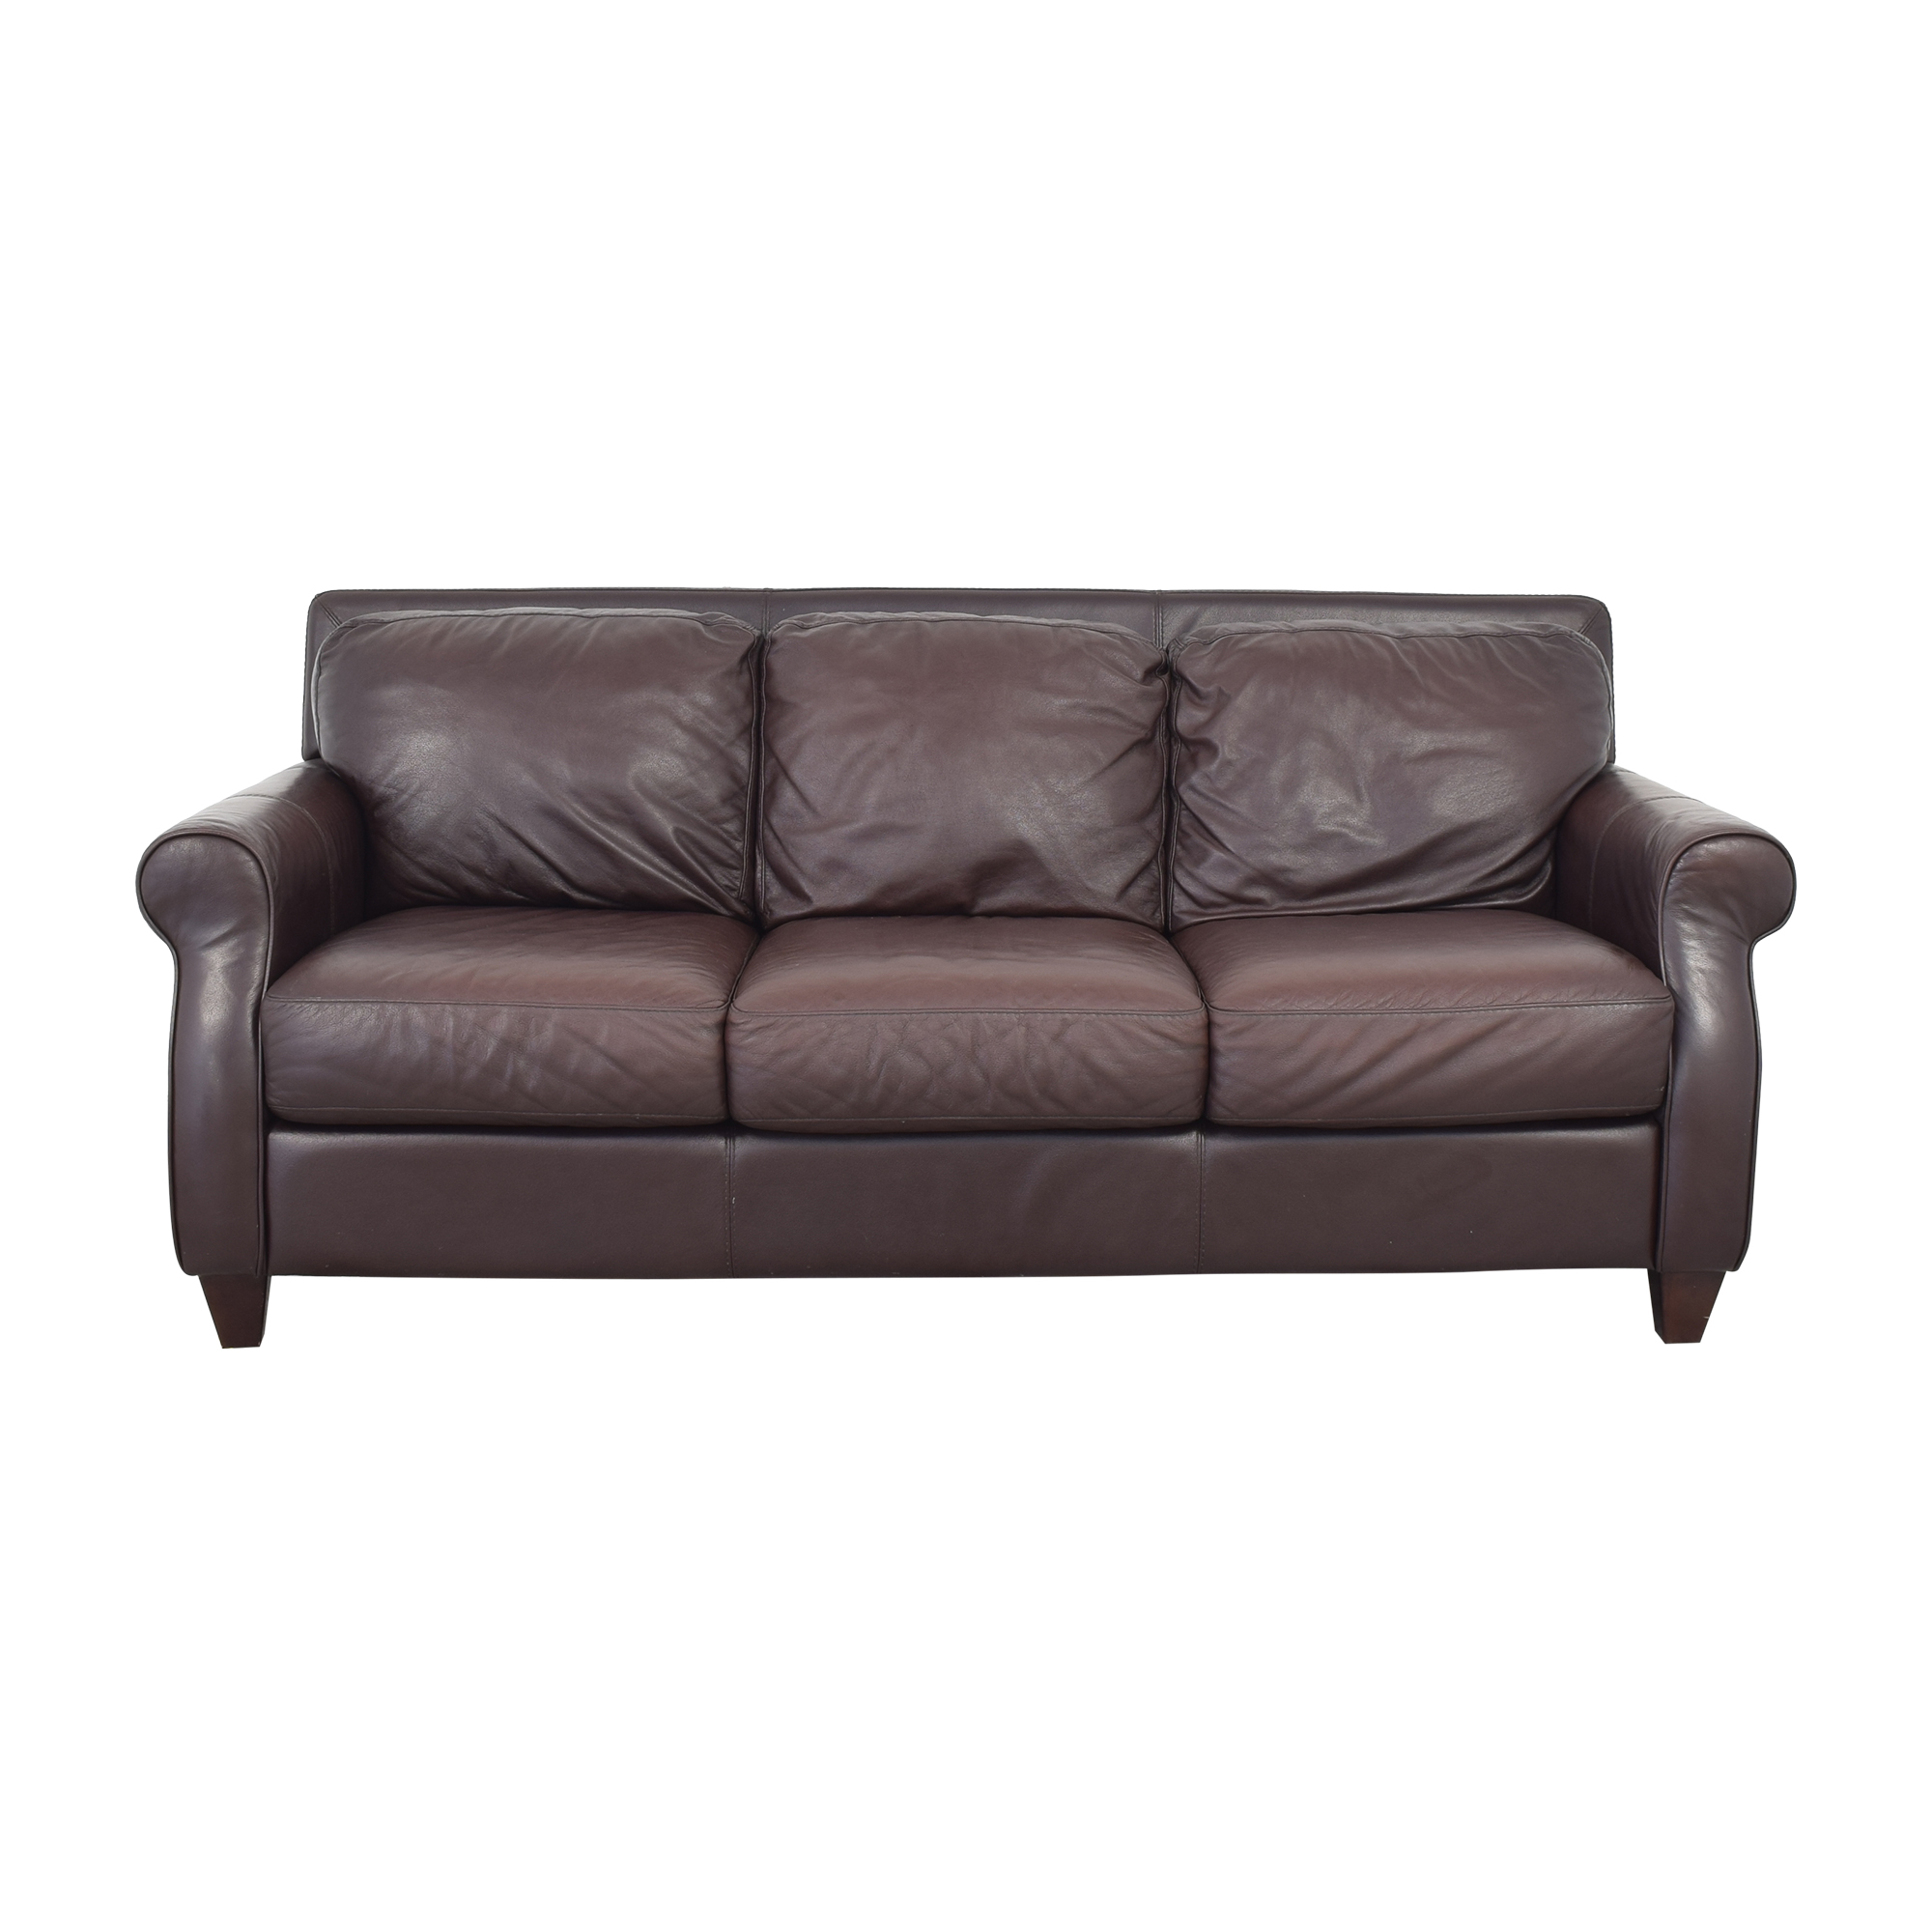 shop Raymour & Flanigan Three Cushion Sofa Raymour & Flanigan Classic Sofas